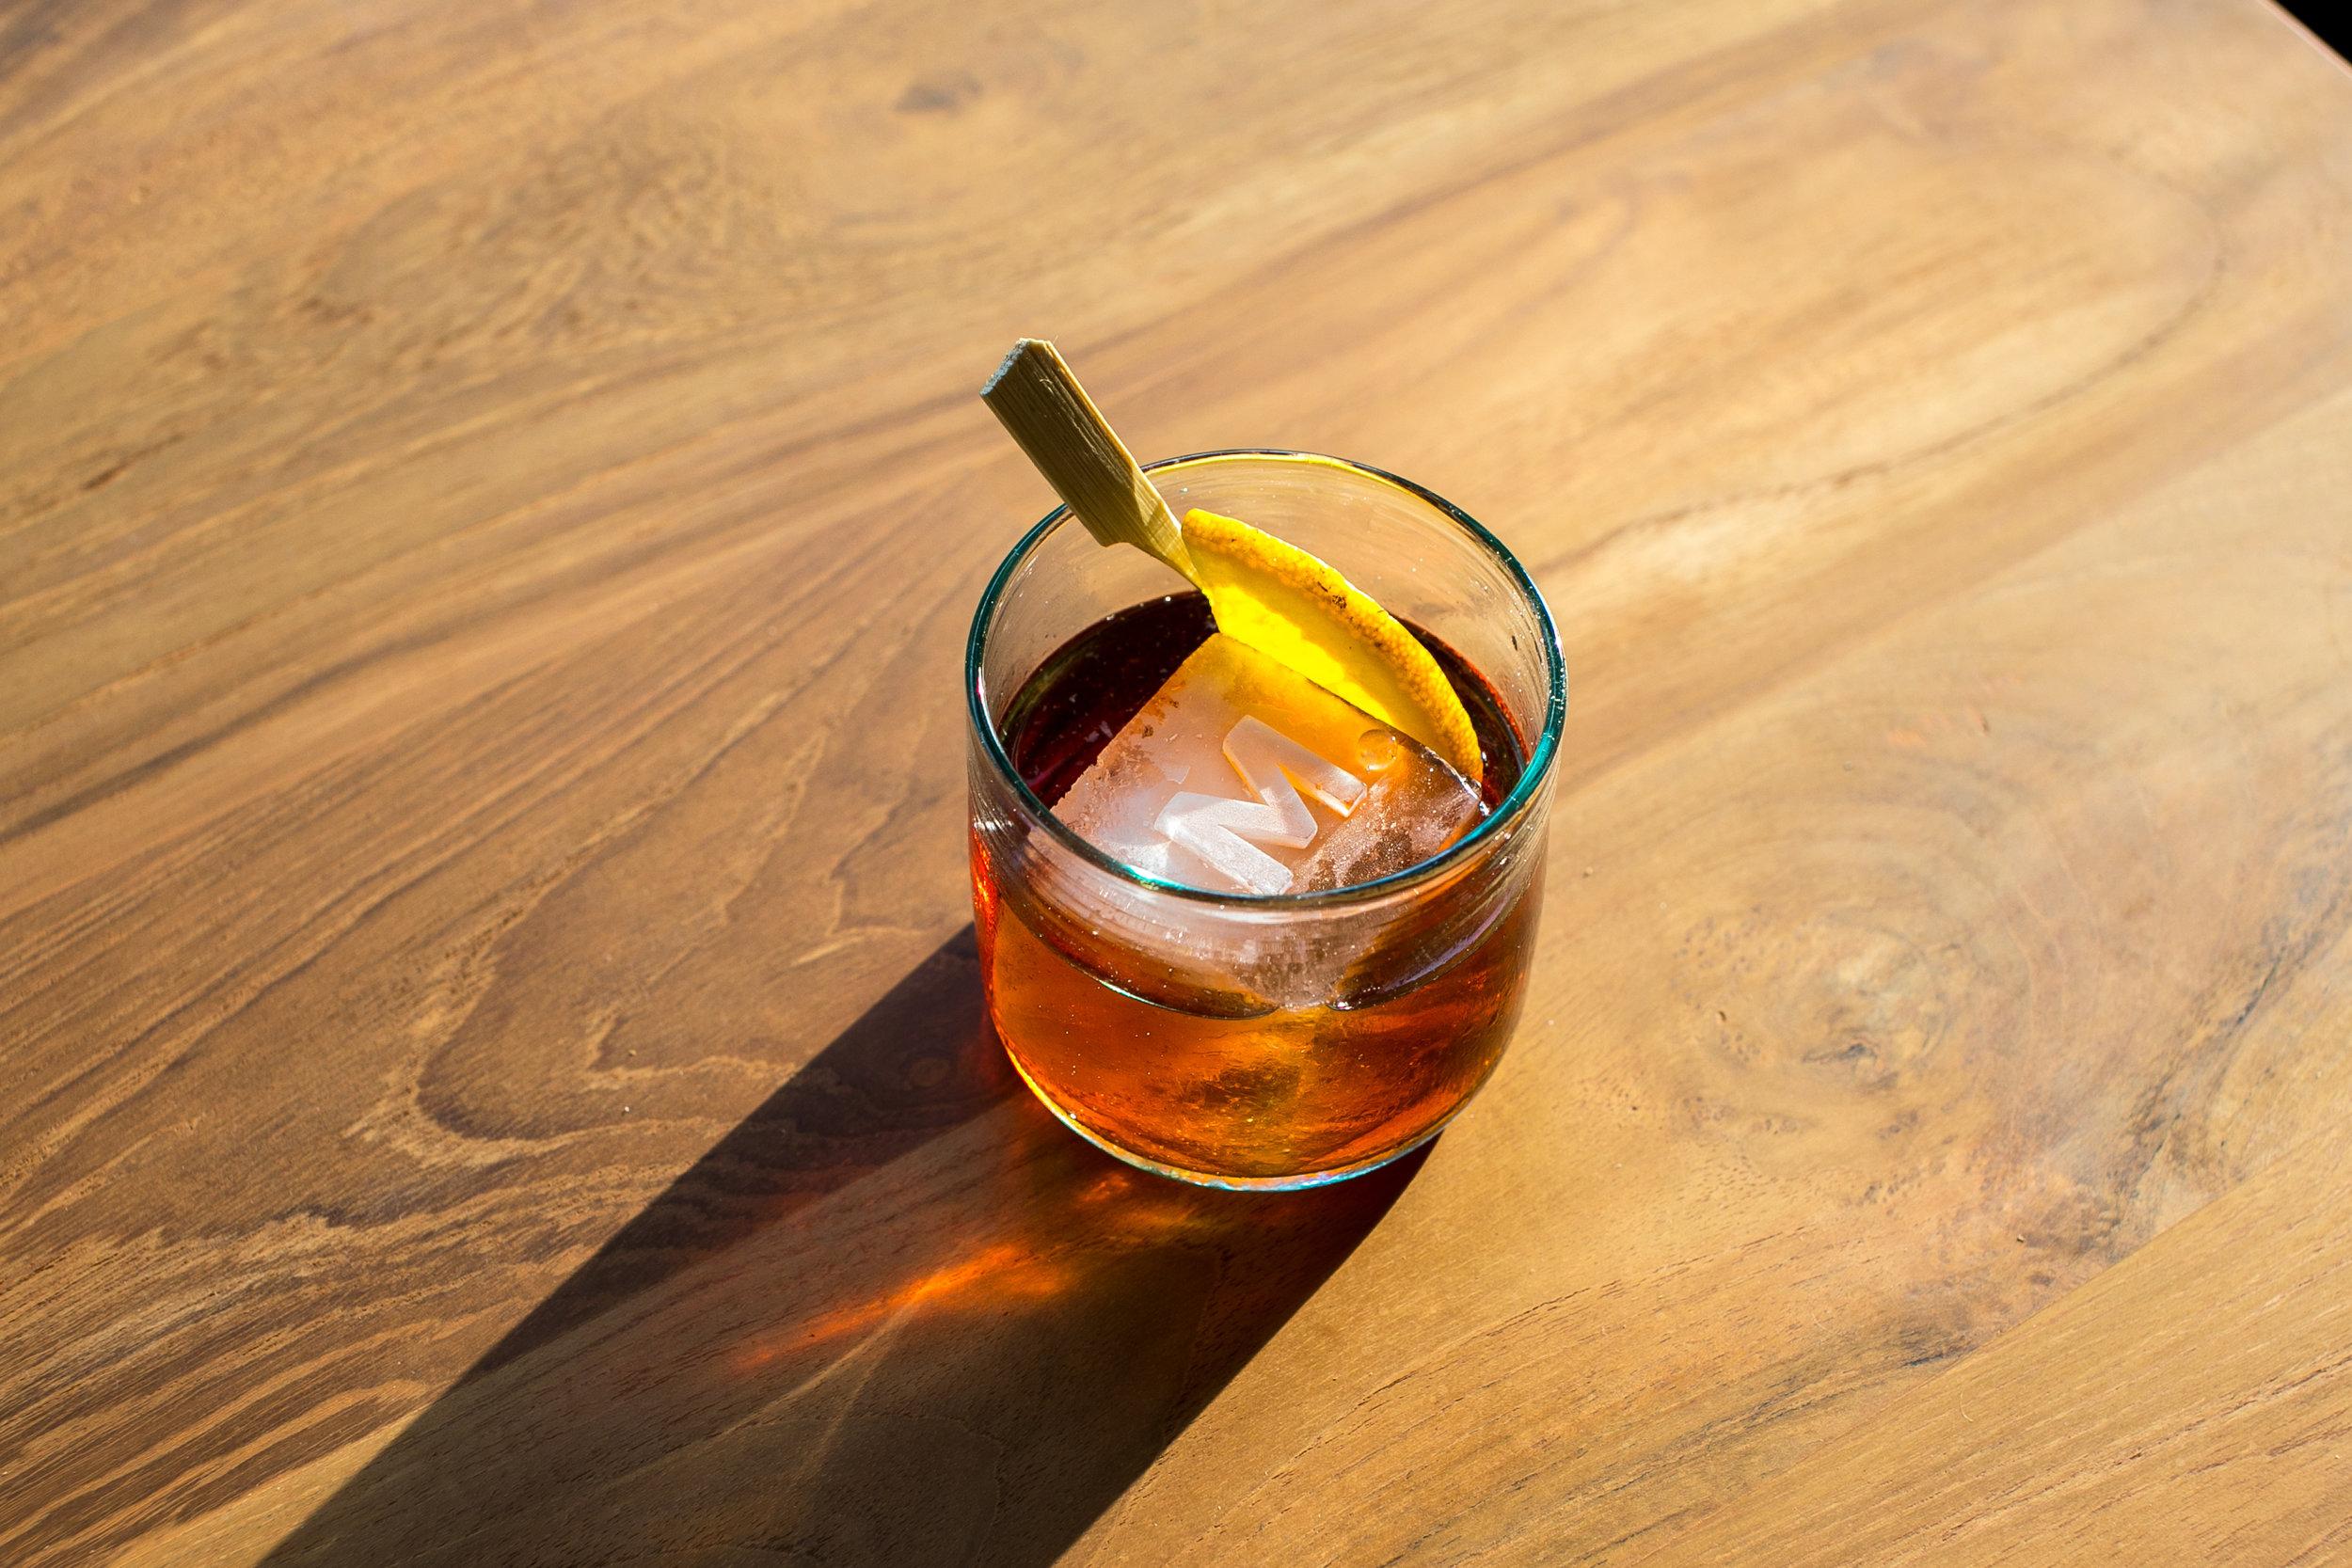 mason_drinks_joeyg_normalcrop-9043.jpg